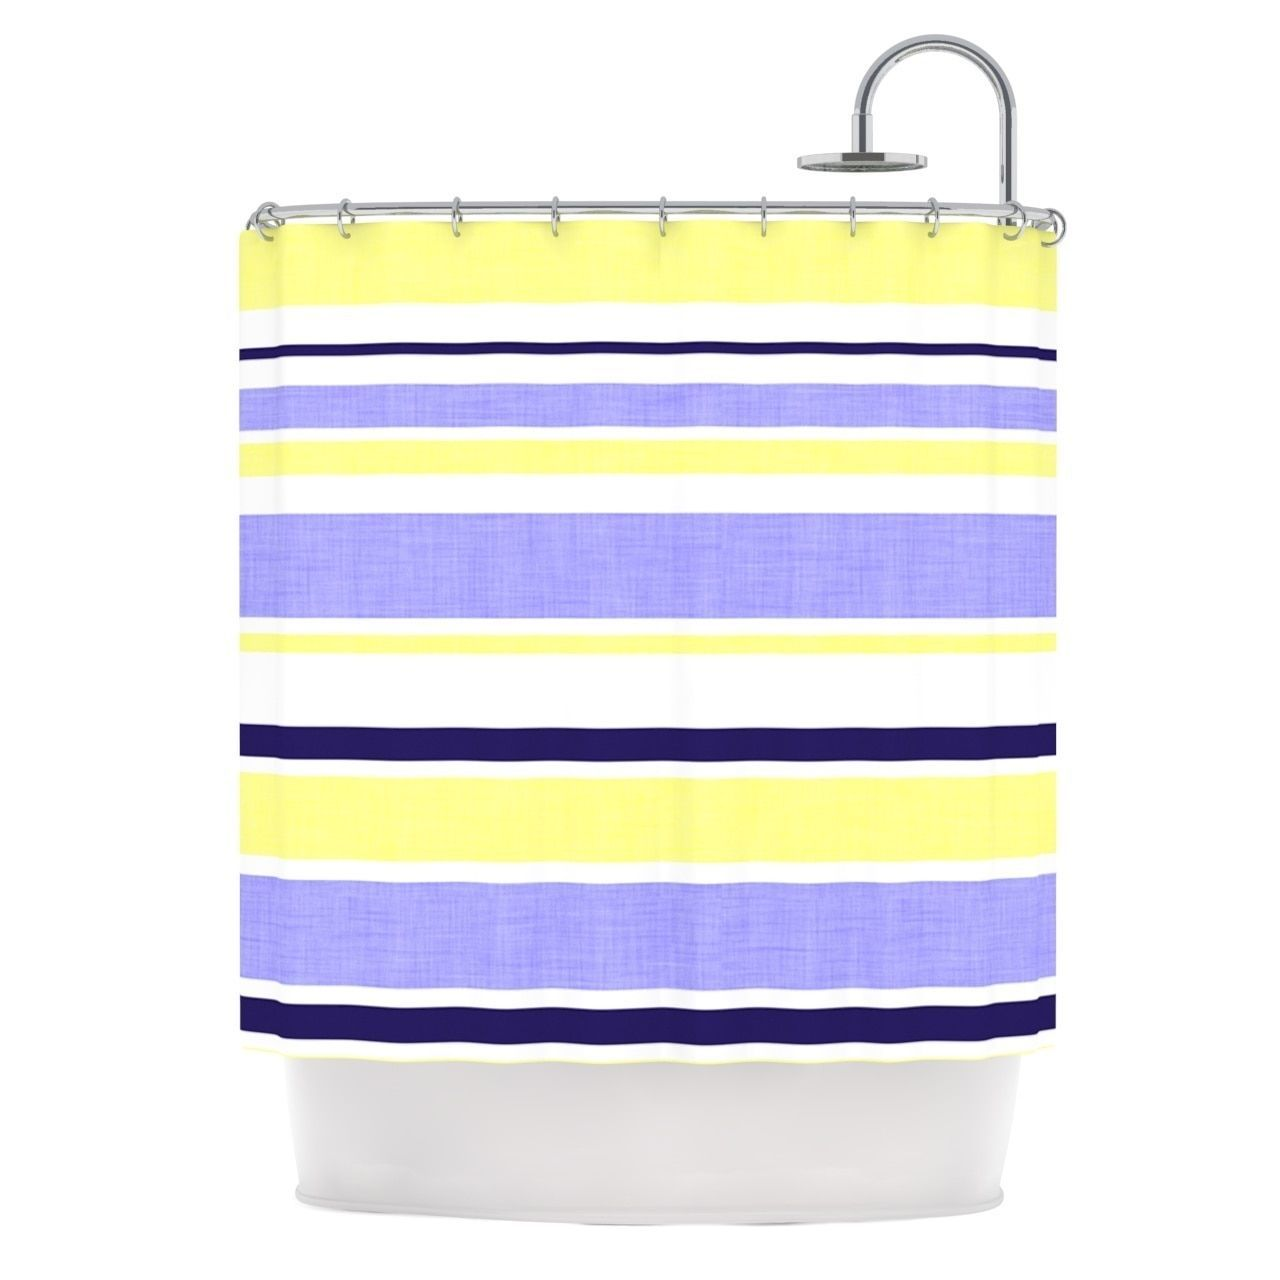 purple and yellow shower curtain. KESS InHouse Alison Coxon Jack Tar Purple Yellow Shower Curtain  69x70 by Kess